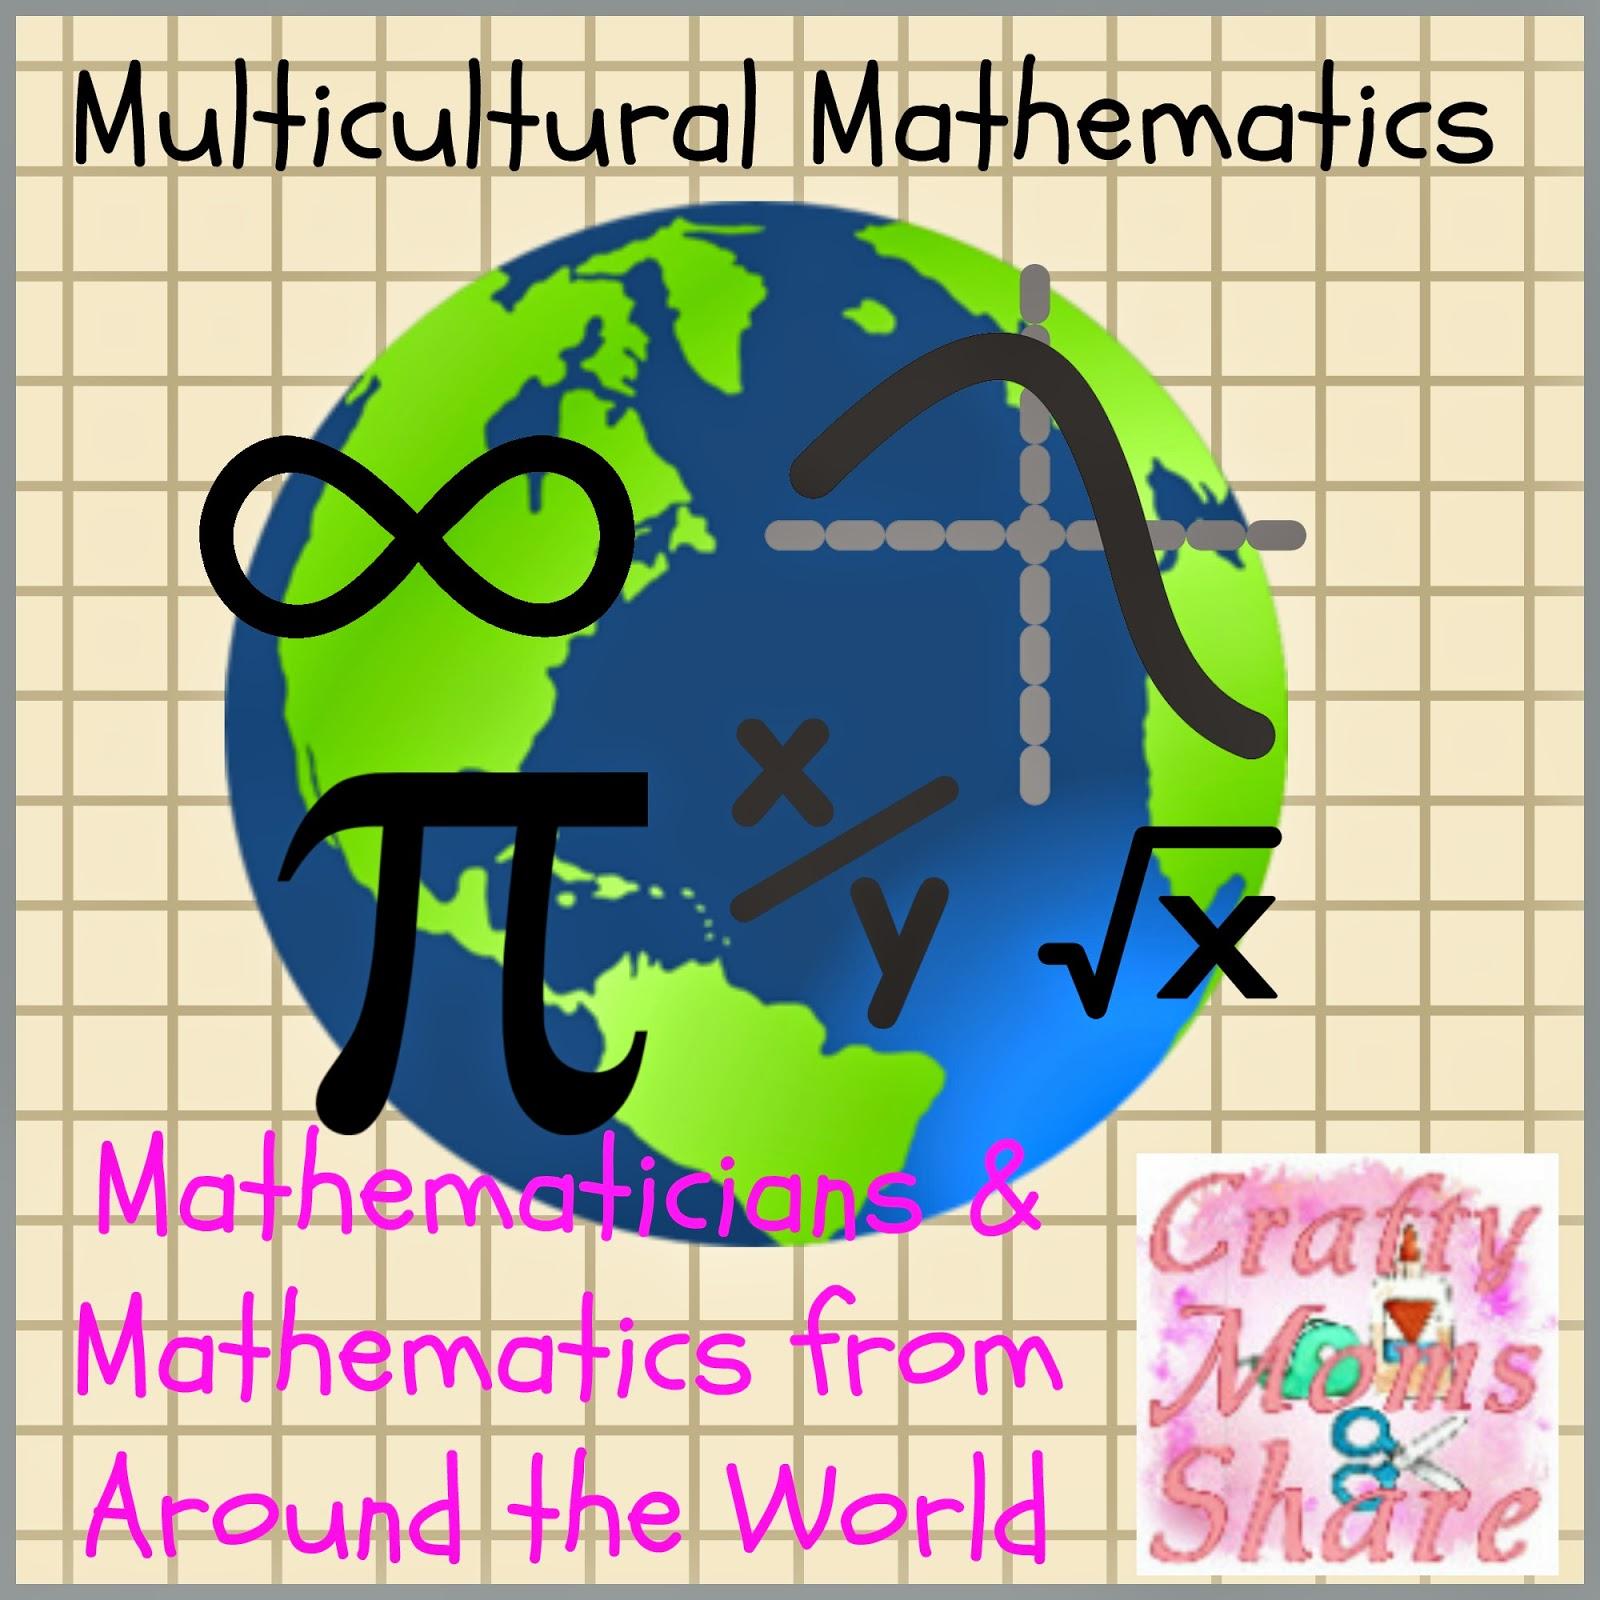 http://craftymomsshare.blogspot.com/p/multicultural-mathematics.html